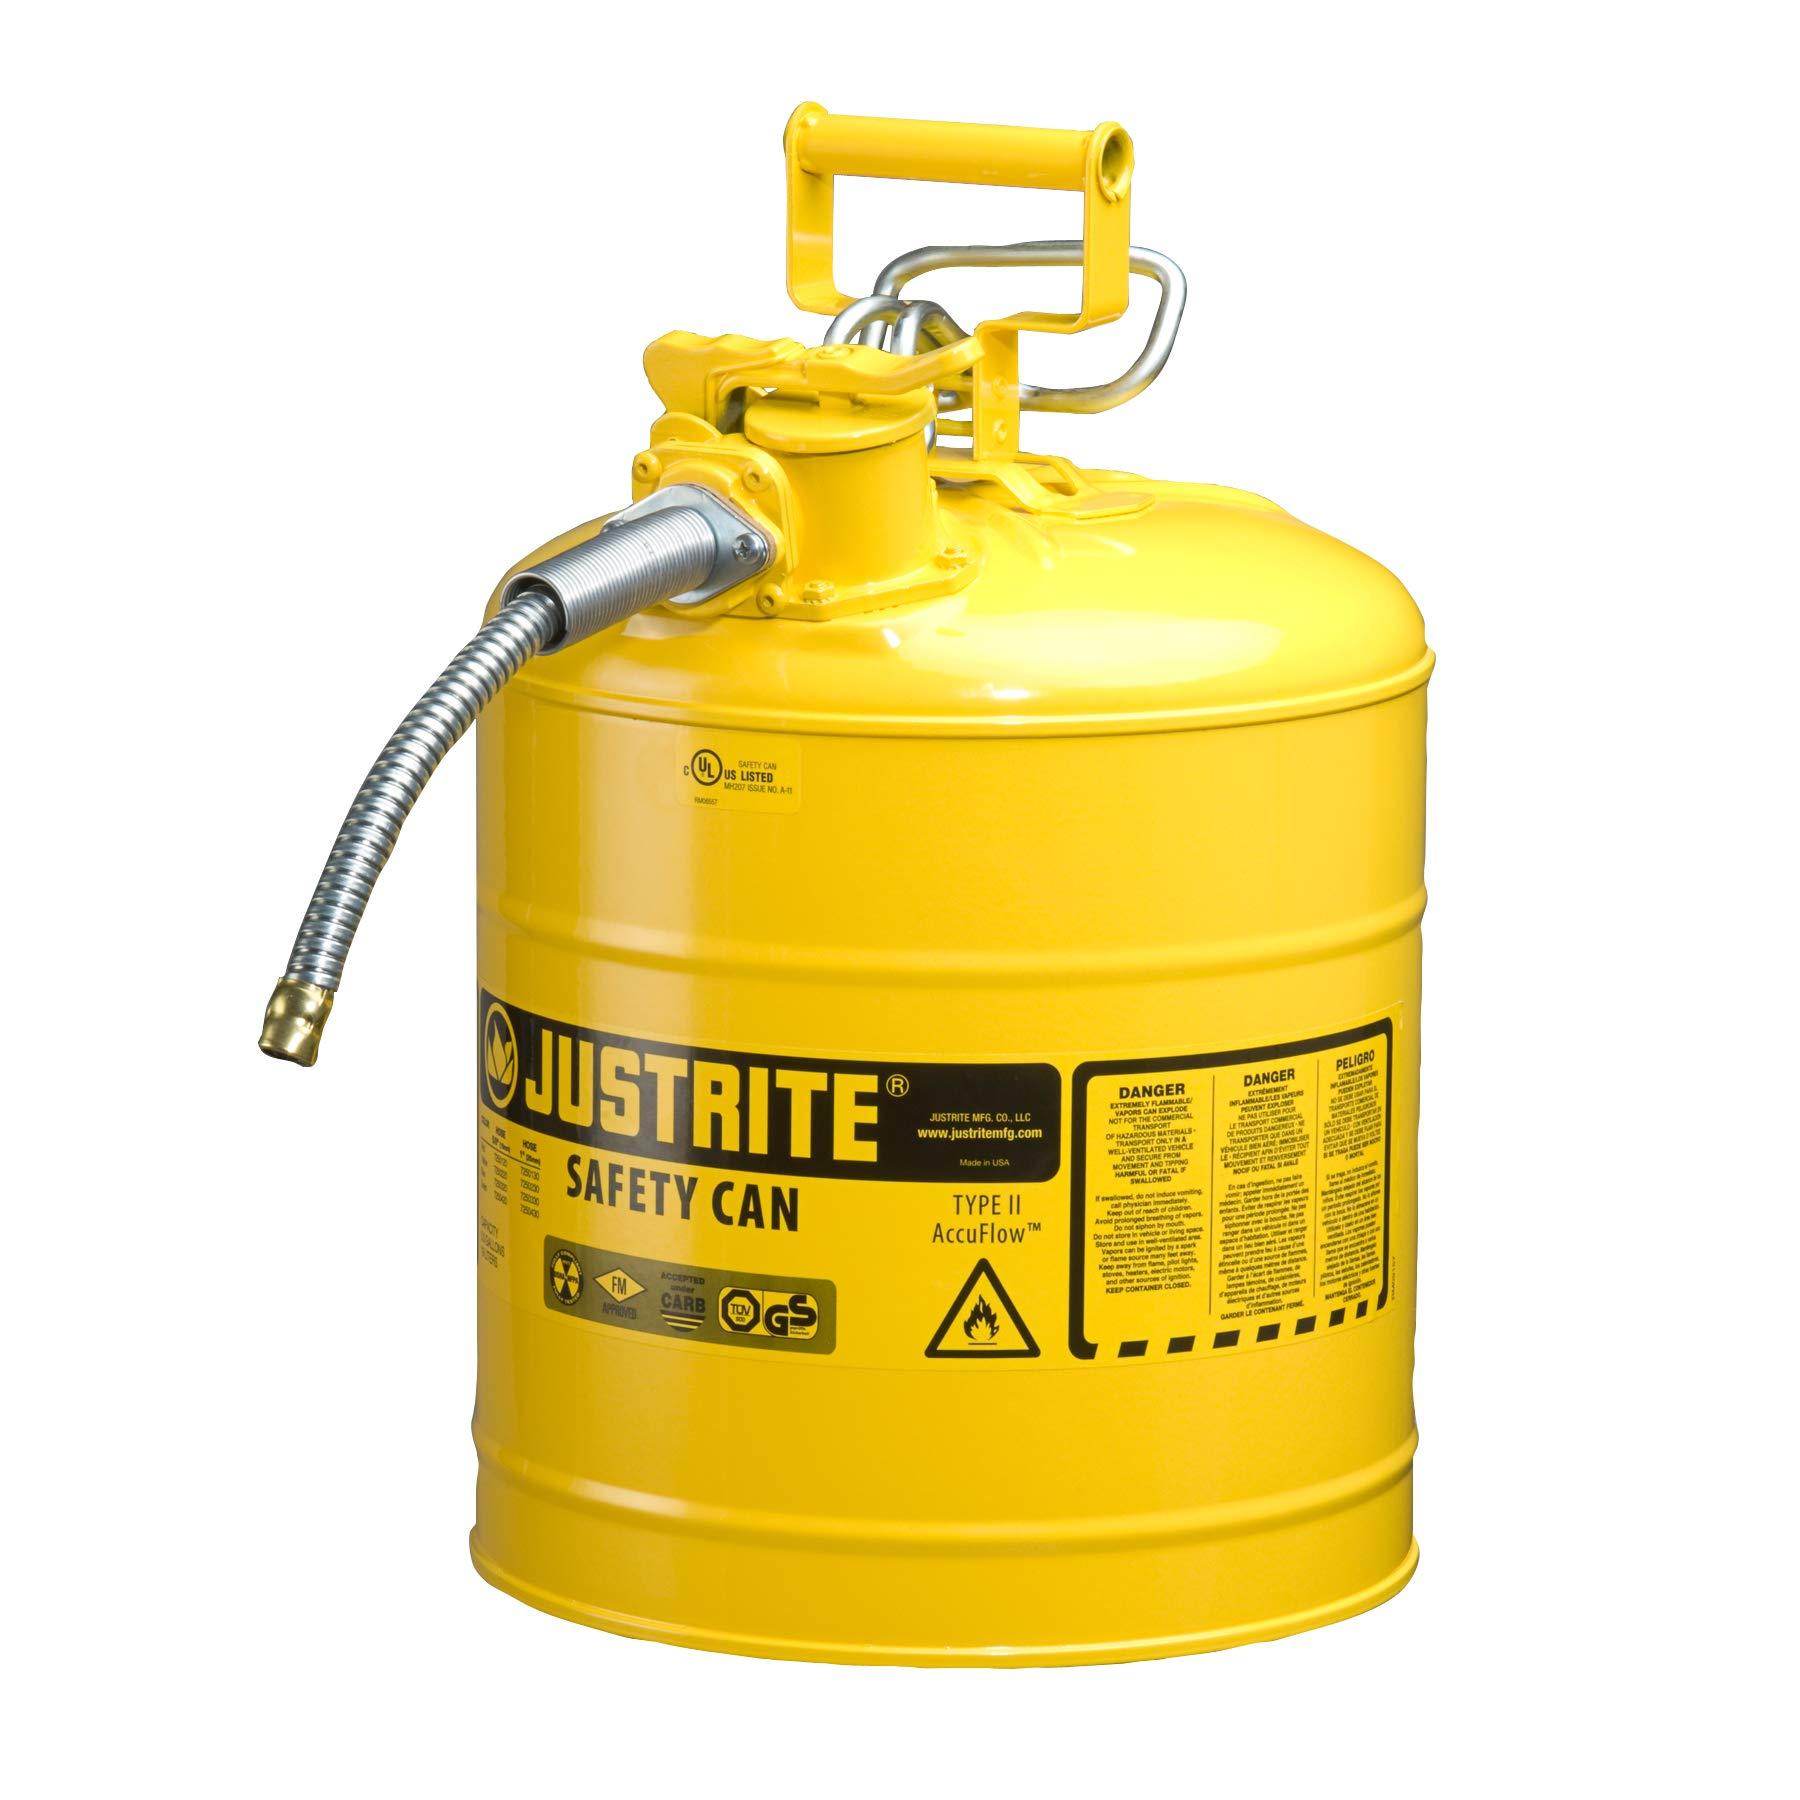 Justrite 7250220 Type 2 Diesel Can, 5/8in Hose, 5 Gal, Yellow